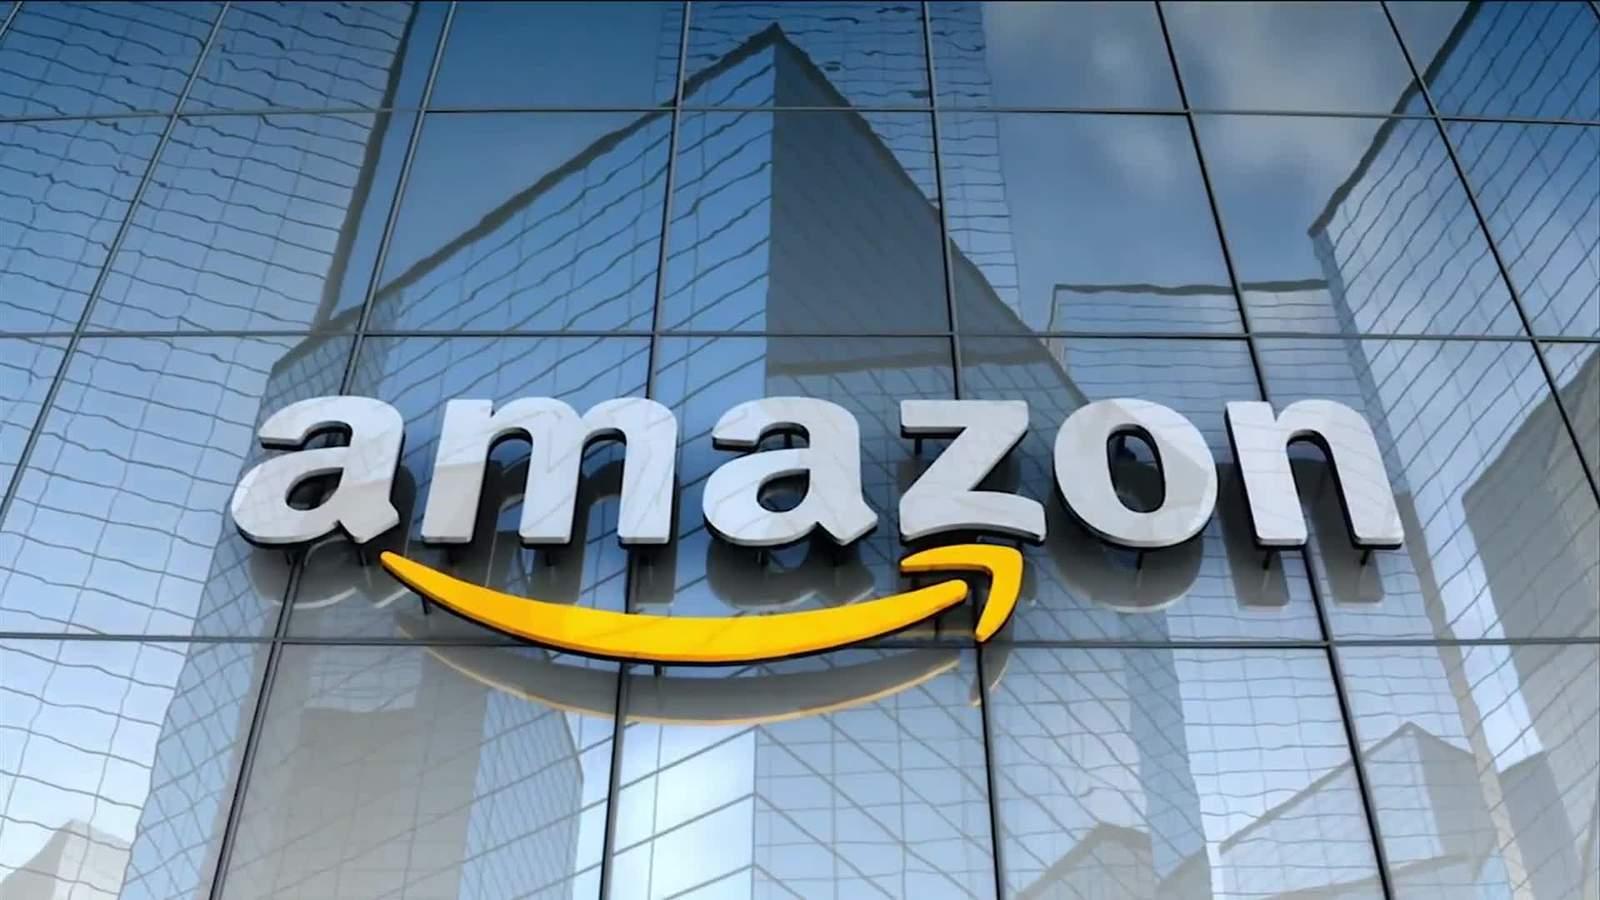 Amazon: Τα υψηλόβαθμα στελέχη εγκαταλείπουν τον Τζεφ Μπέζος – Ψάχνουν  καλύτερους μισθούς| newmoney